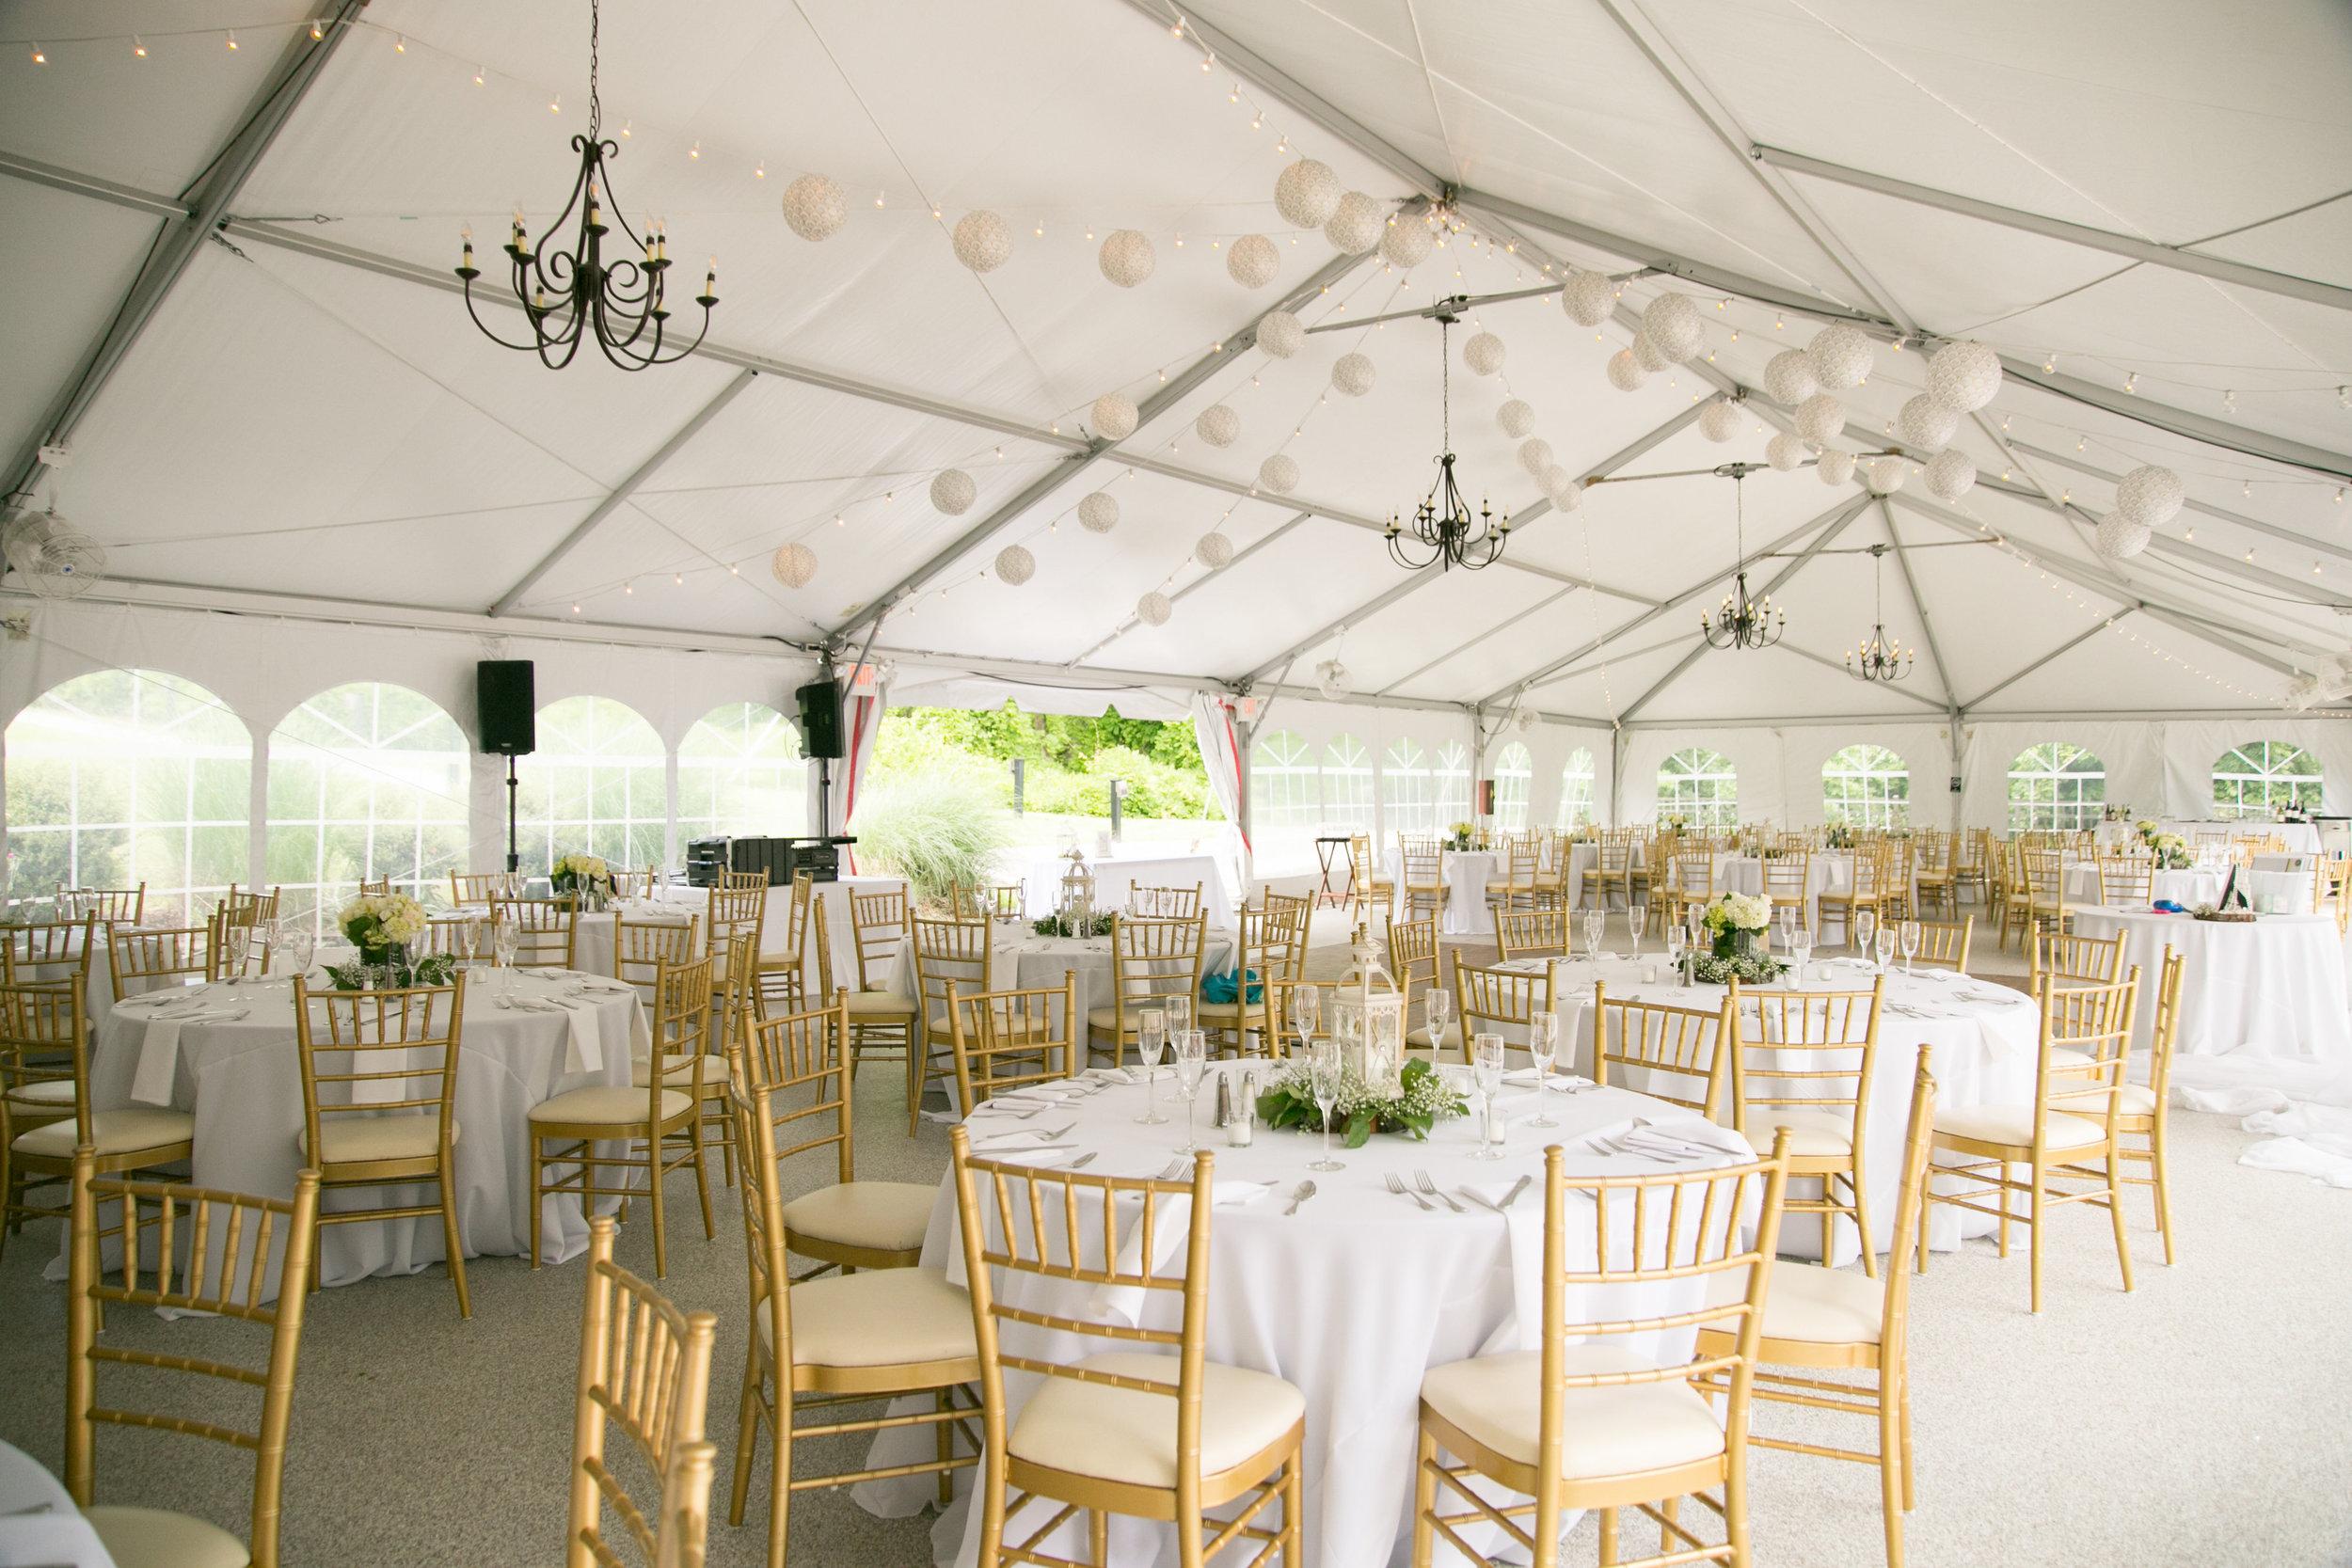 Pure elegance events Tynise Kee dc wedding planner va wedding planner rust manor house leesburg -0037.jpg